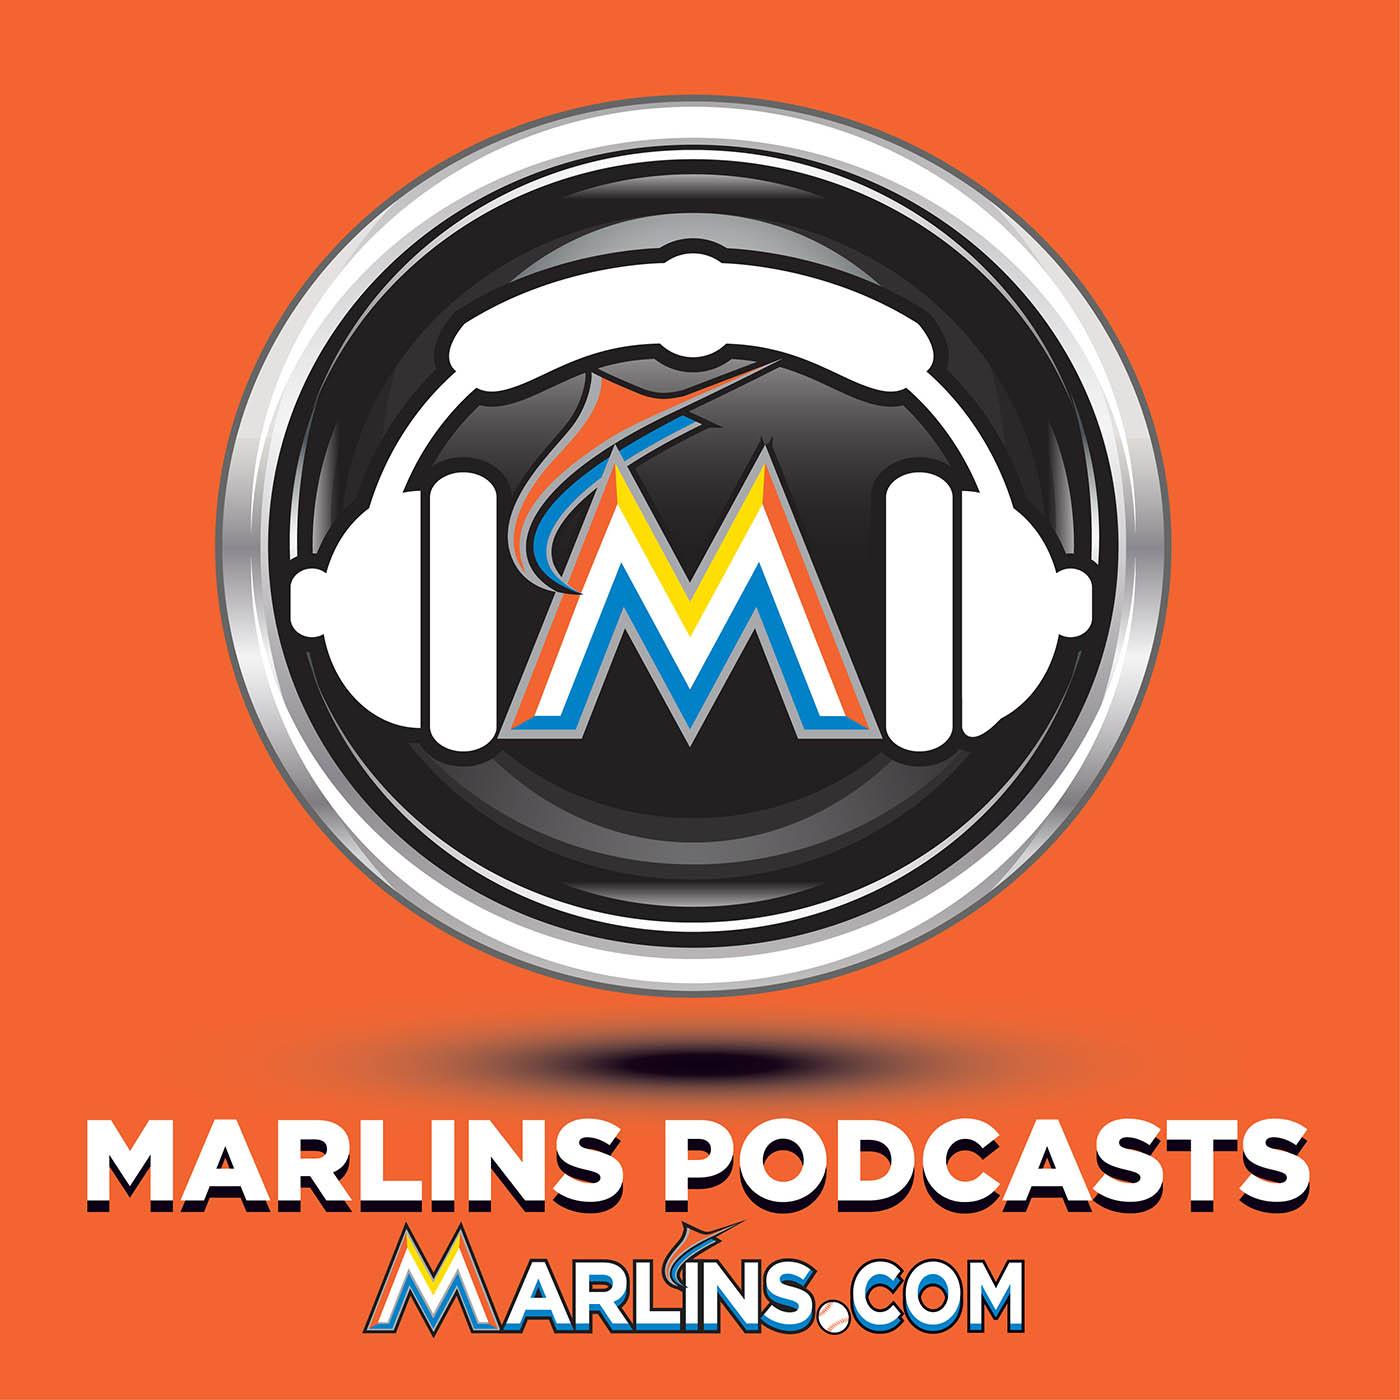 <![CDATA[Miami Marlins Podcast]]>